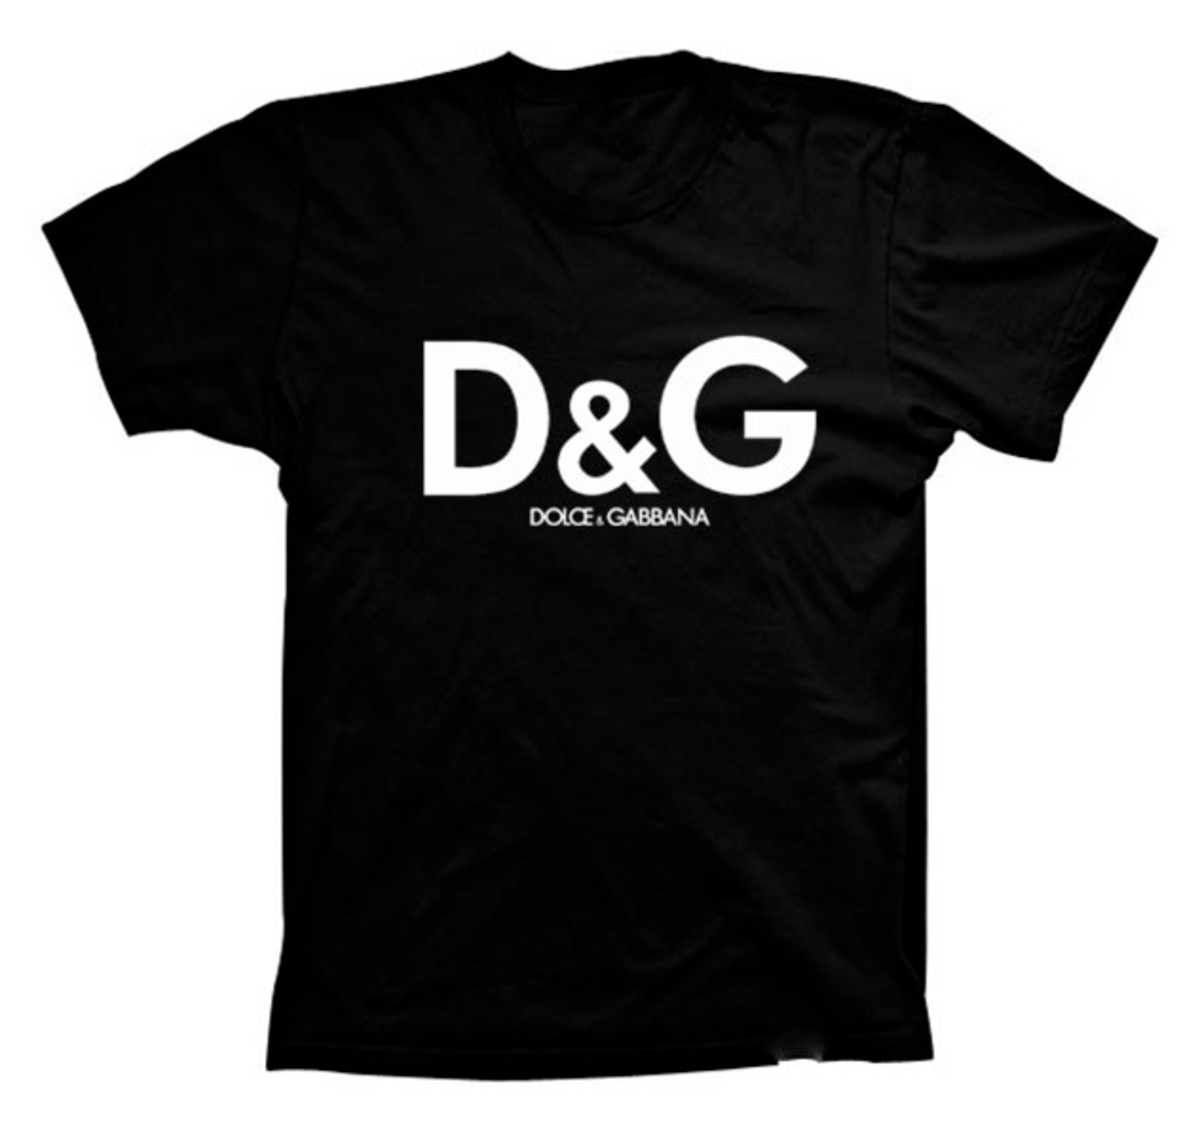 Camiseta D G Dolce   Gabbana Personalizada no Elo7  6df4fef7ebb